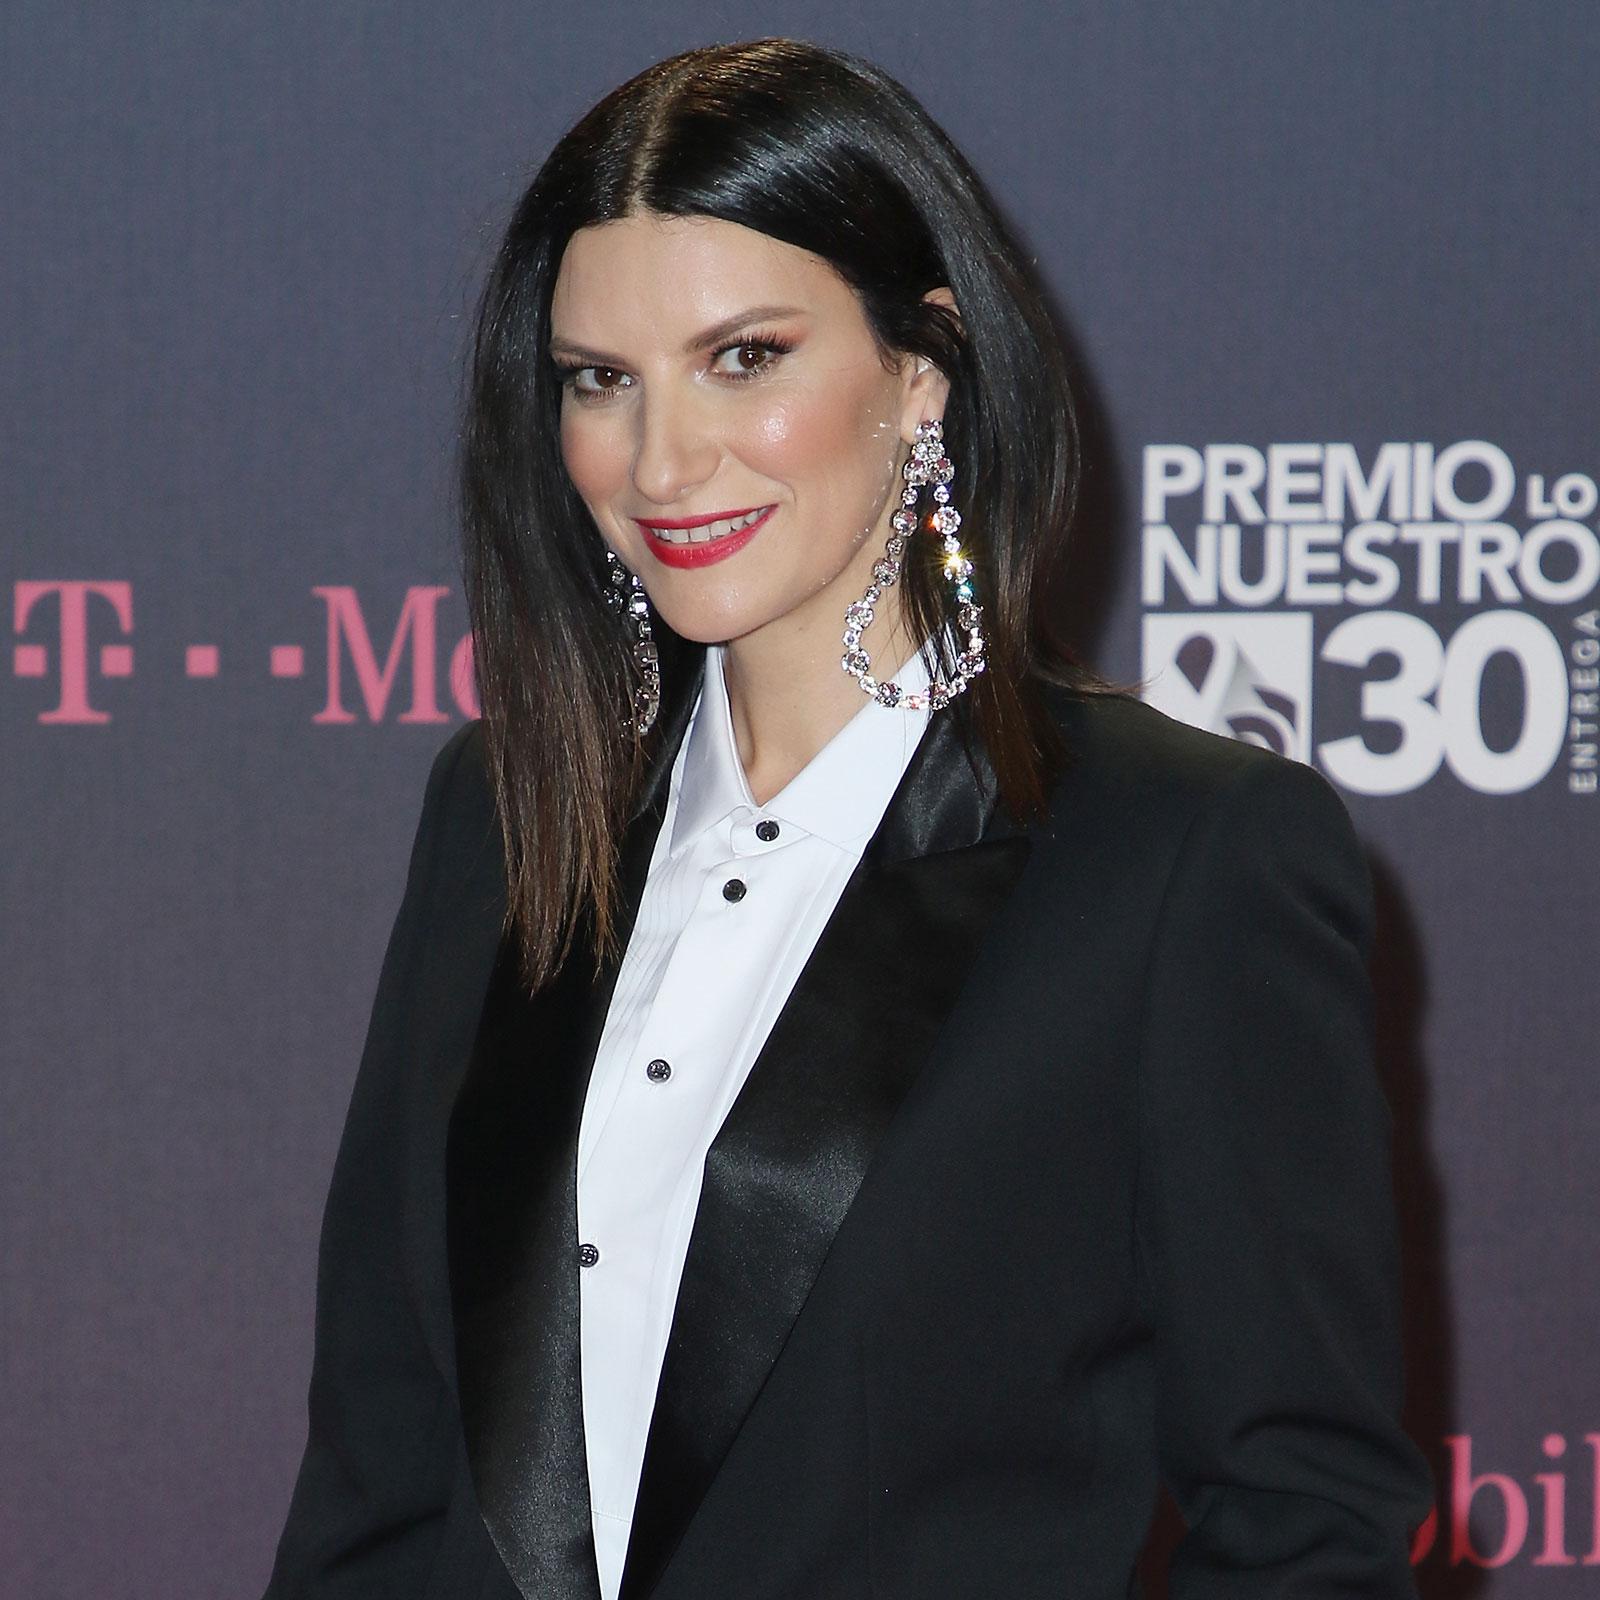 Laura Pausini, look, maquillaje, premio lo nuestro, mejore